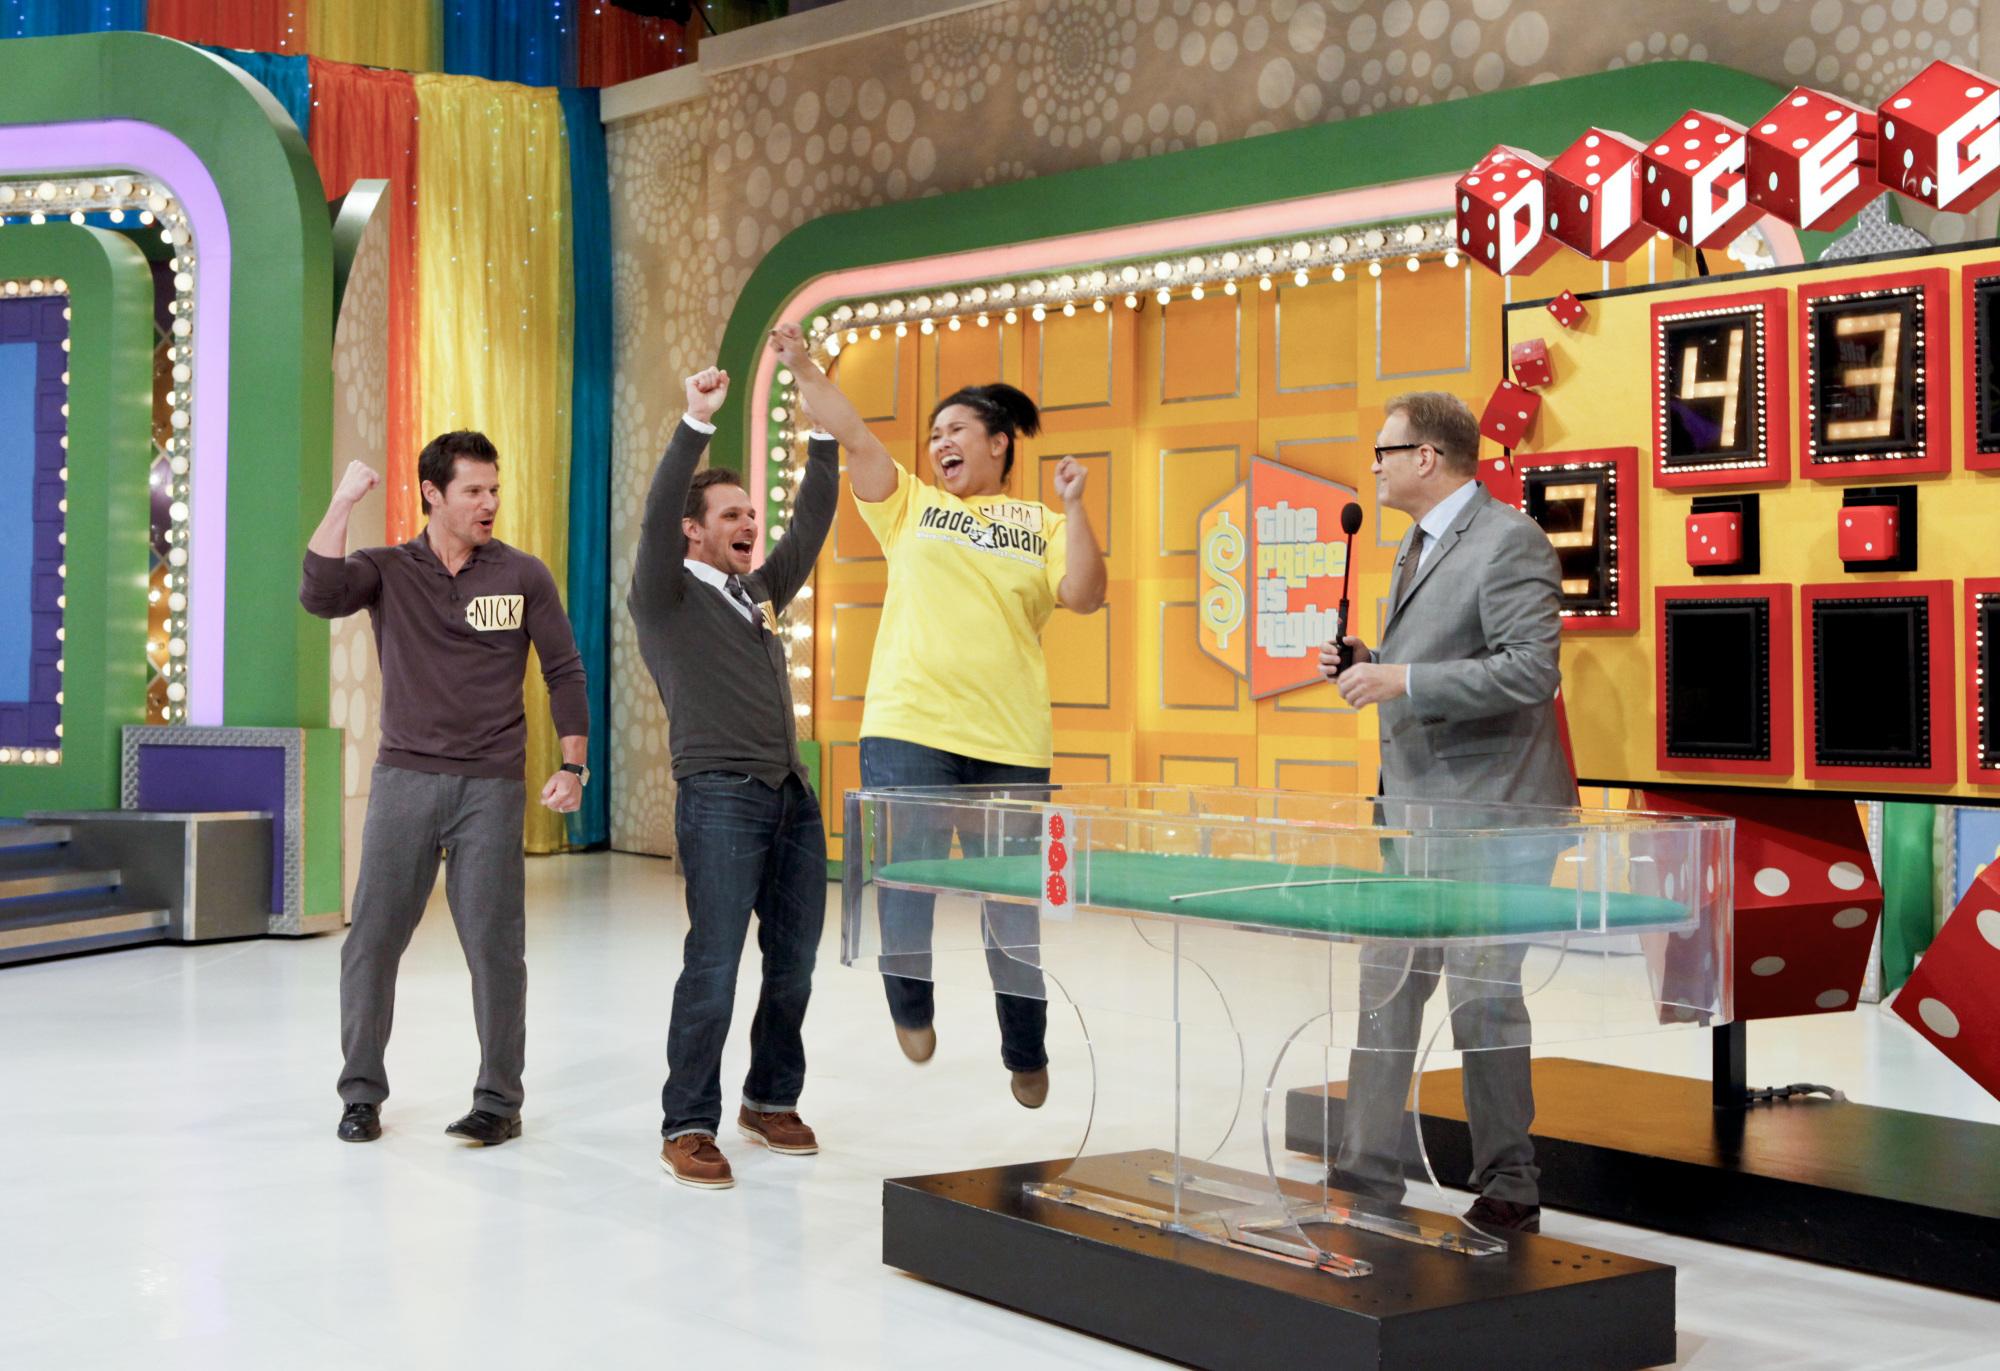 Nick, Drew, and Contestant!